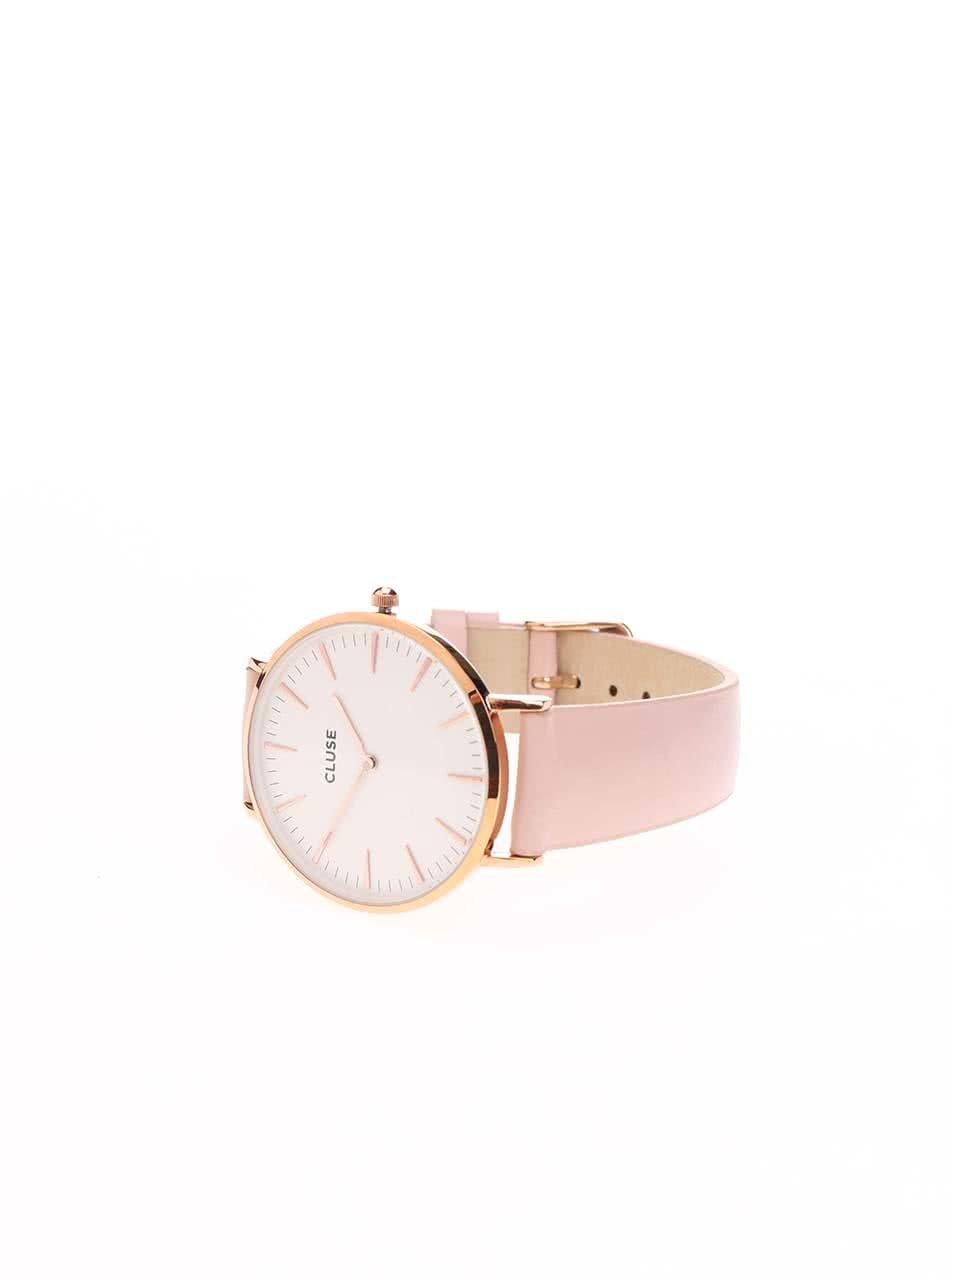 Bílo-růžové dámské kožené hodinky CLUSE La Bohème Rose Gold ... 59b6b44ede